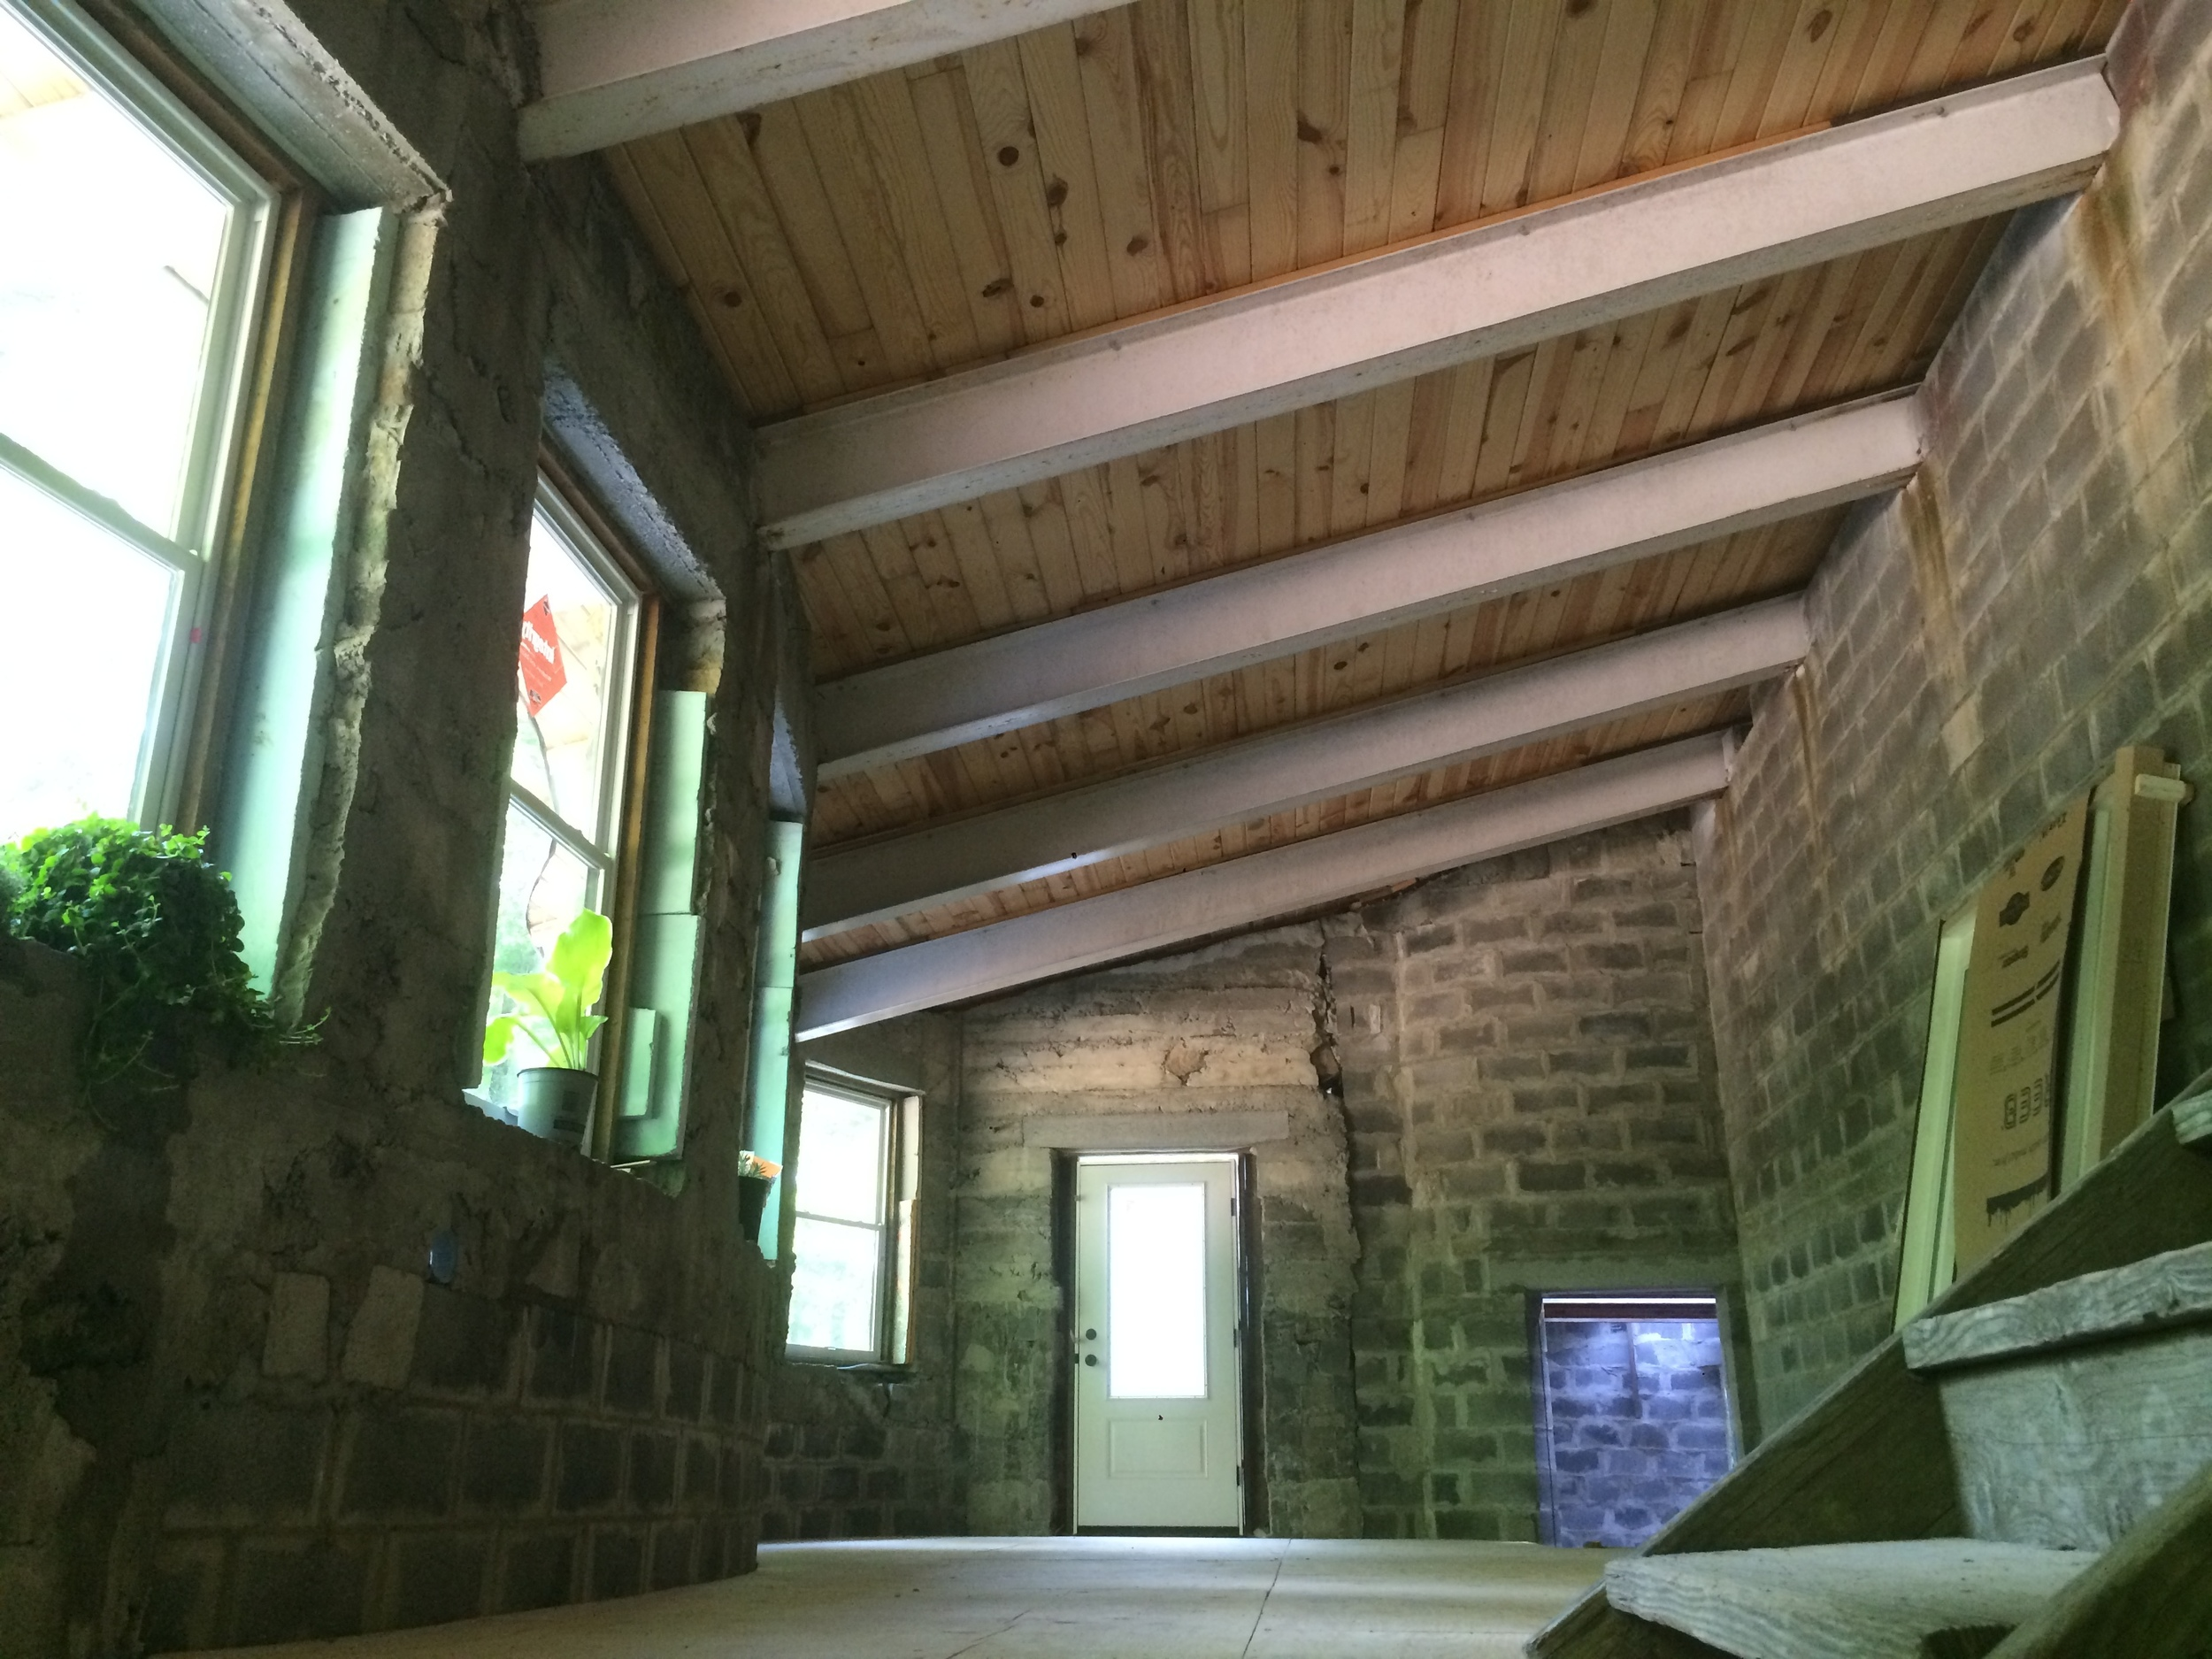 Underhill's kitchen level. Subfloor installed May 2016.